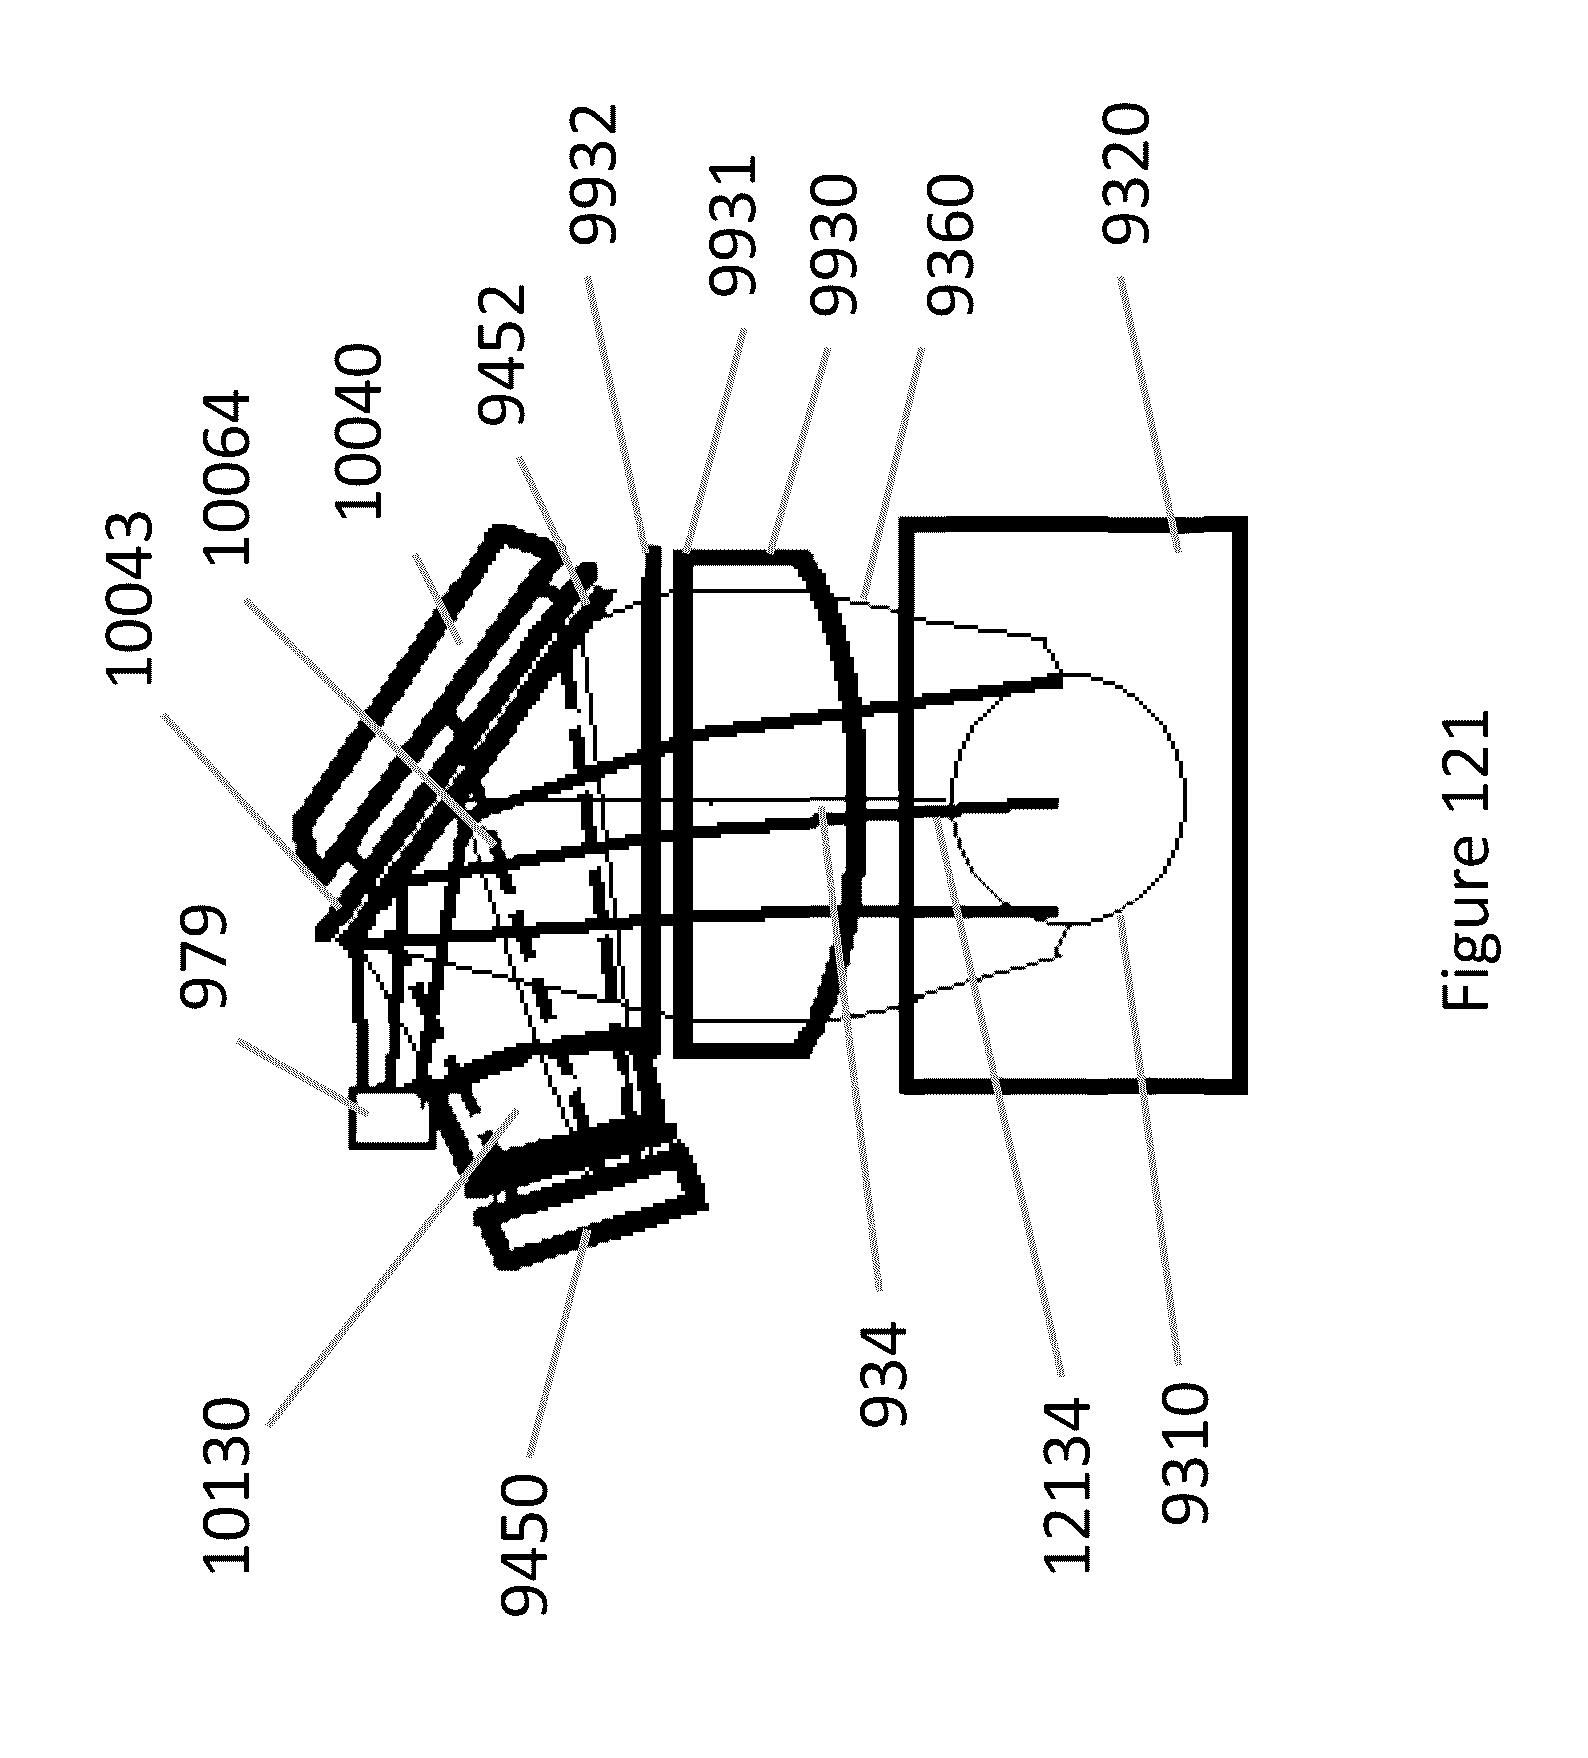 patent us 9 684 172 b2 Fire Sprinkler System Design patent images